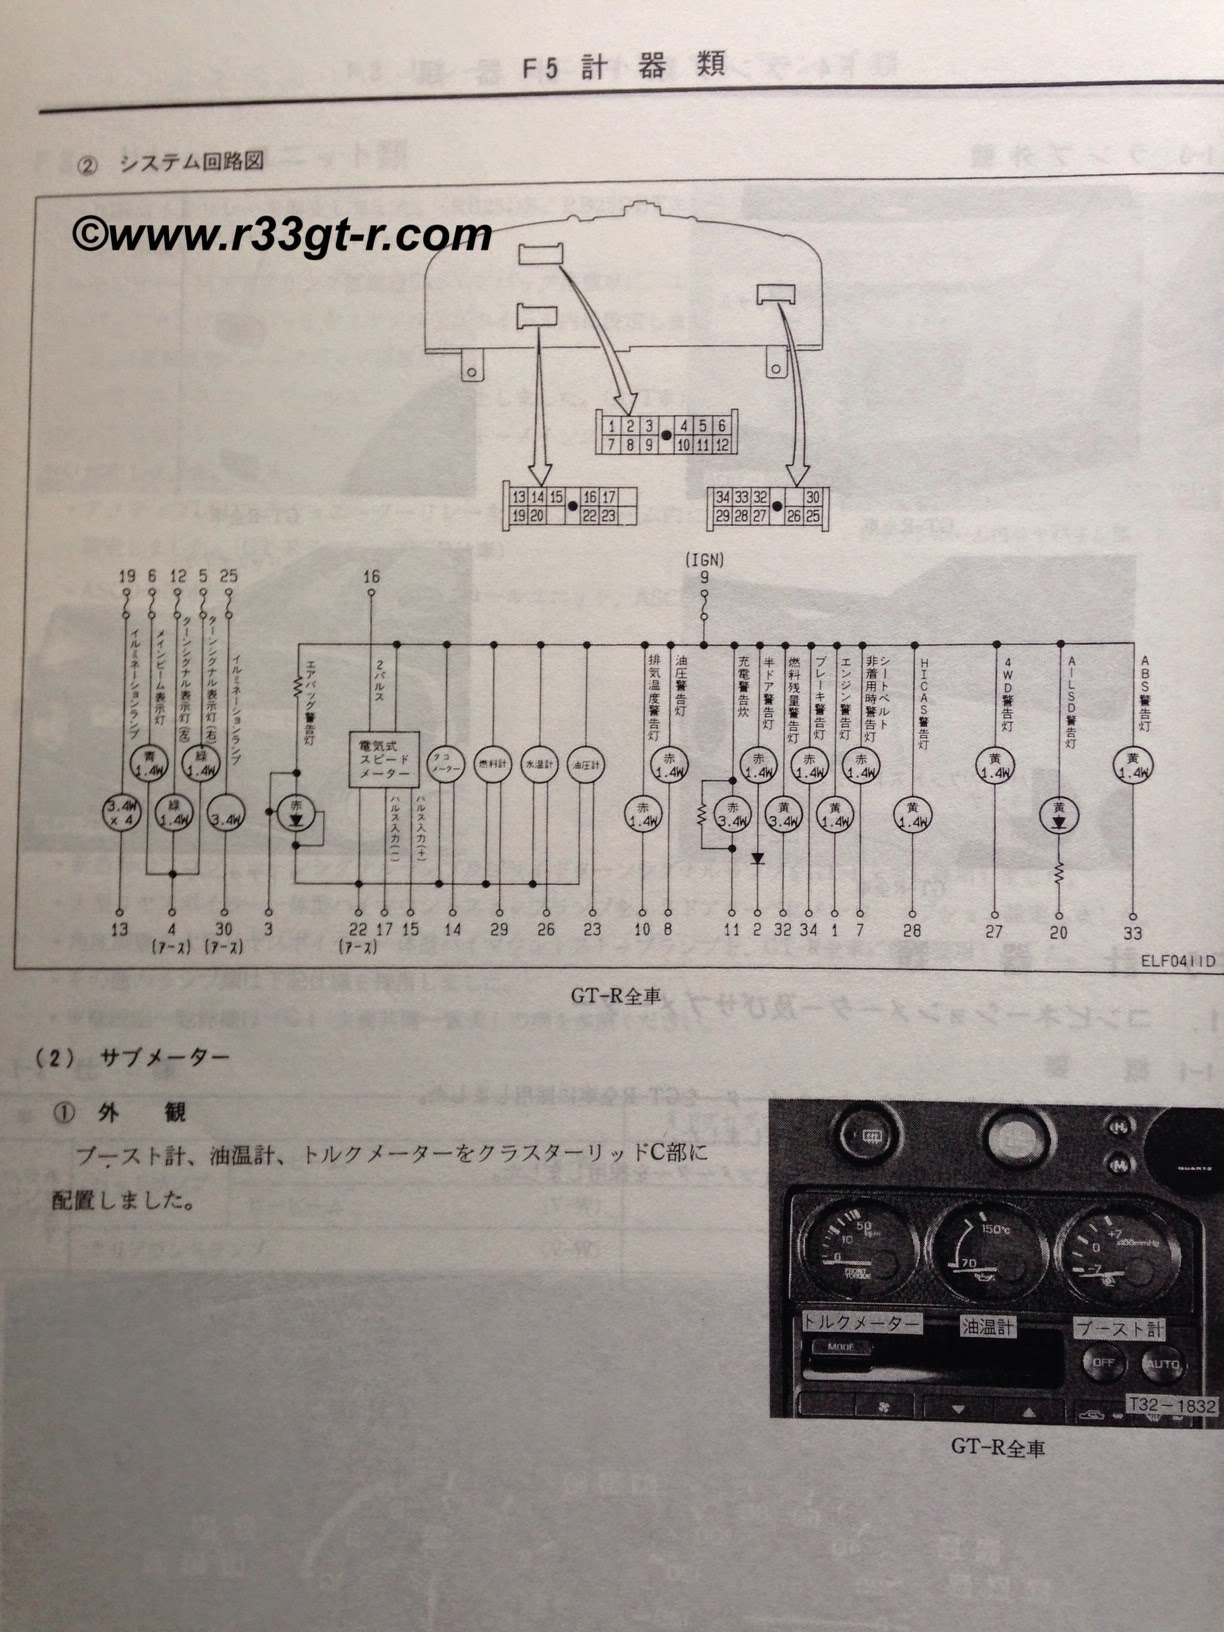 skyline r33 gtst wiring diagram bosch washing machine parts one man 39s lonely adventures in his gt r